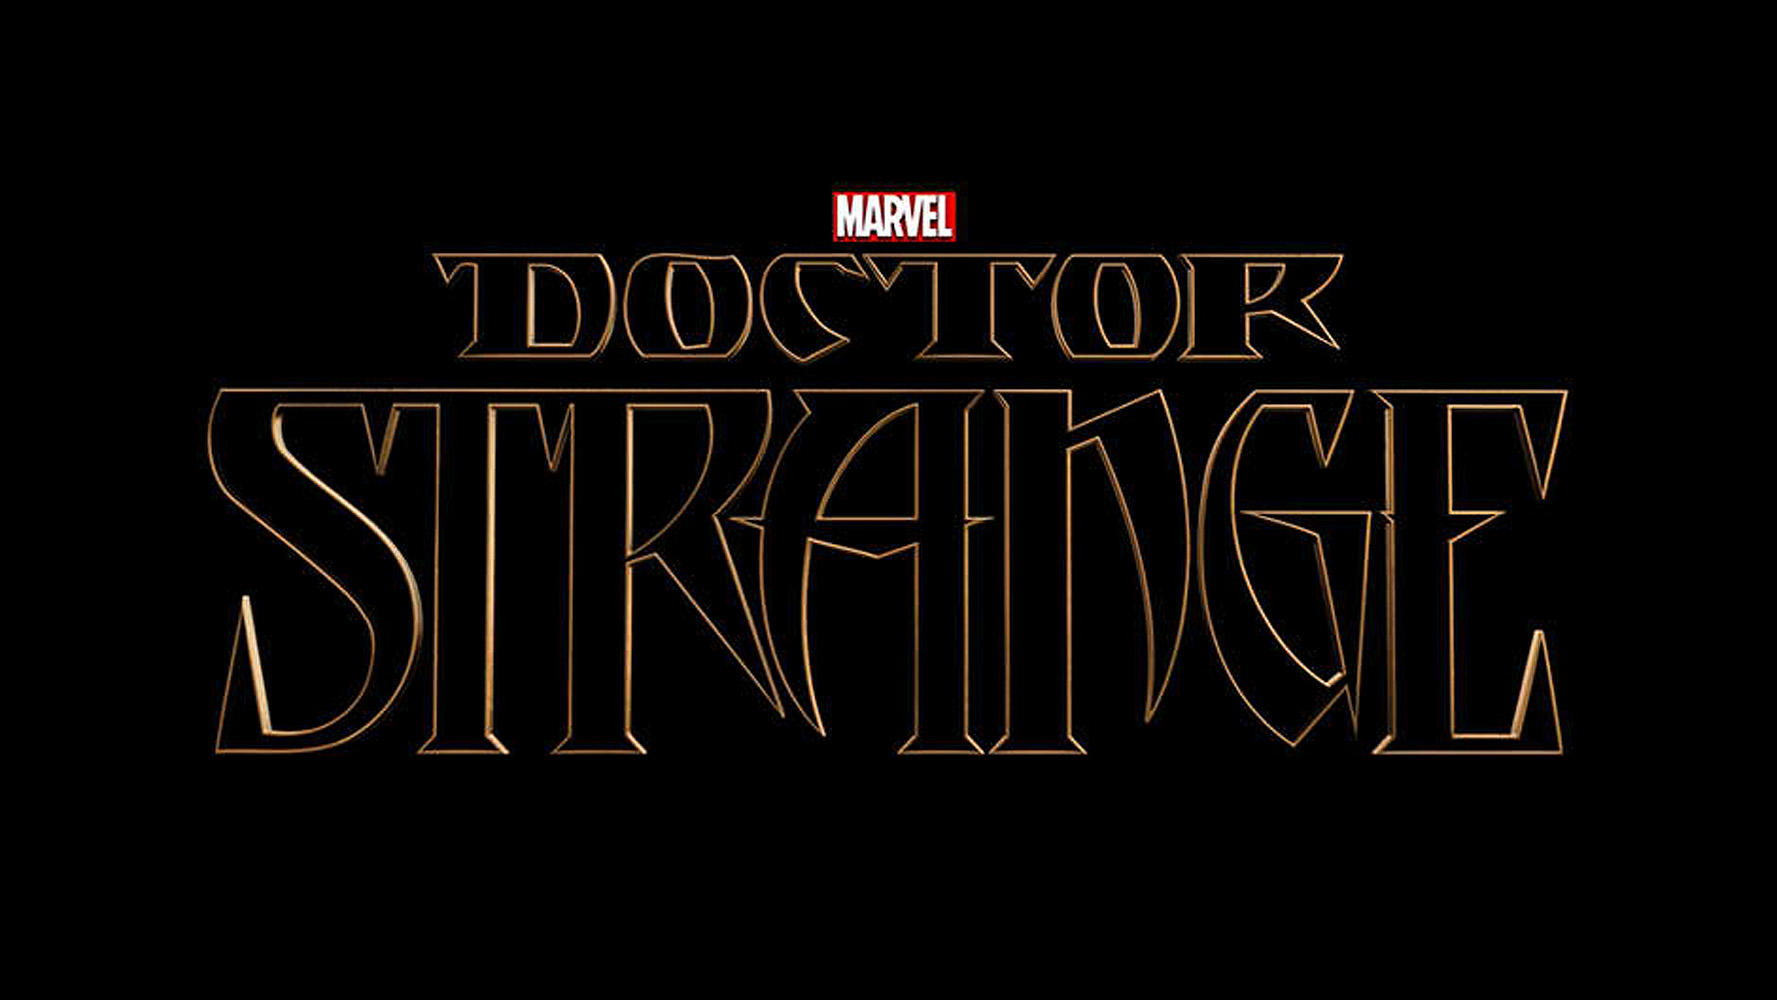 DoctorStrange_TitleTreatment